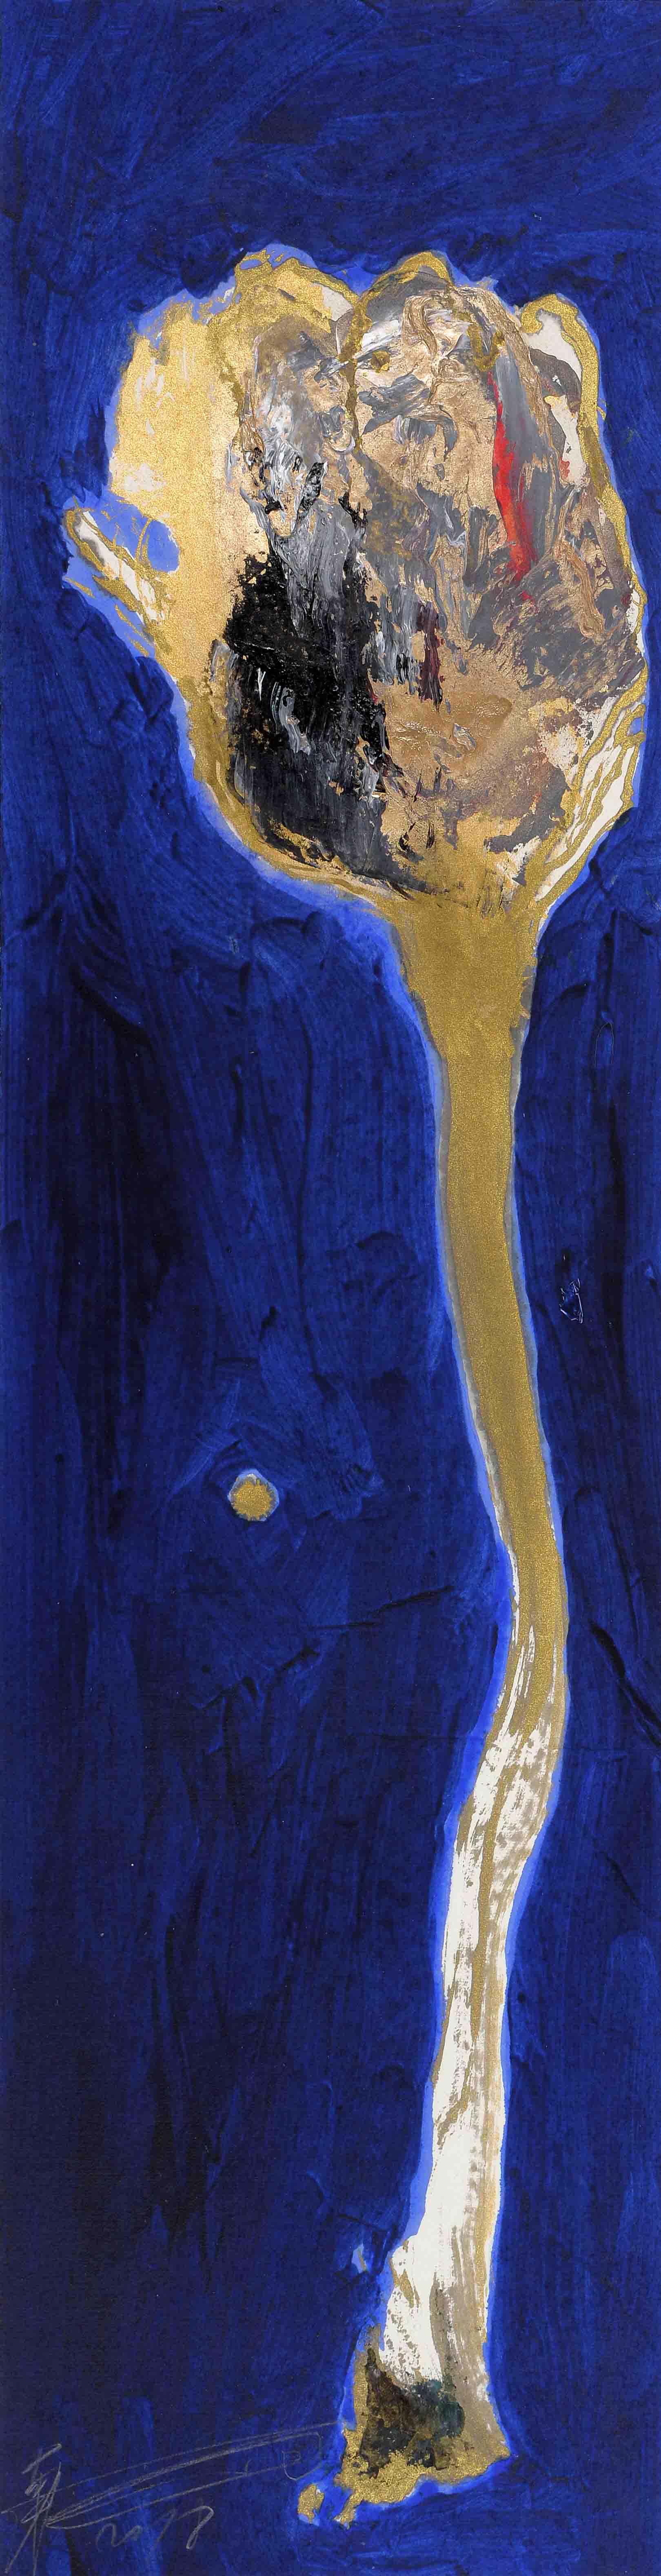 魏立剛 WEI Ligang〈小花–藍Little Flower: Blue〉